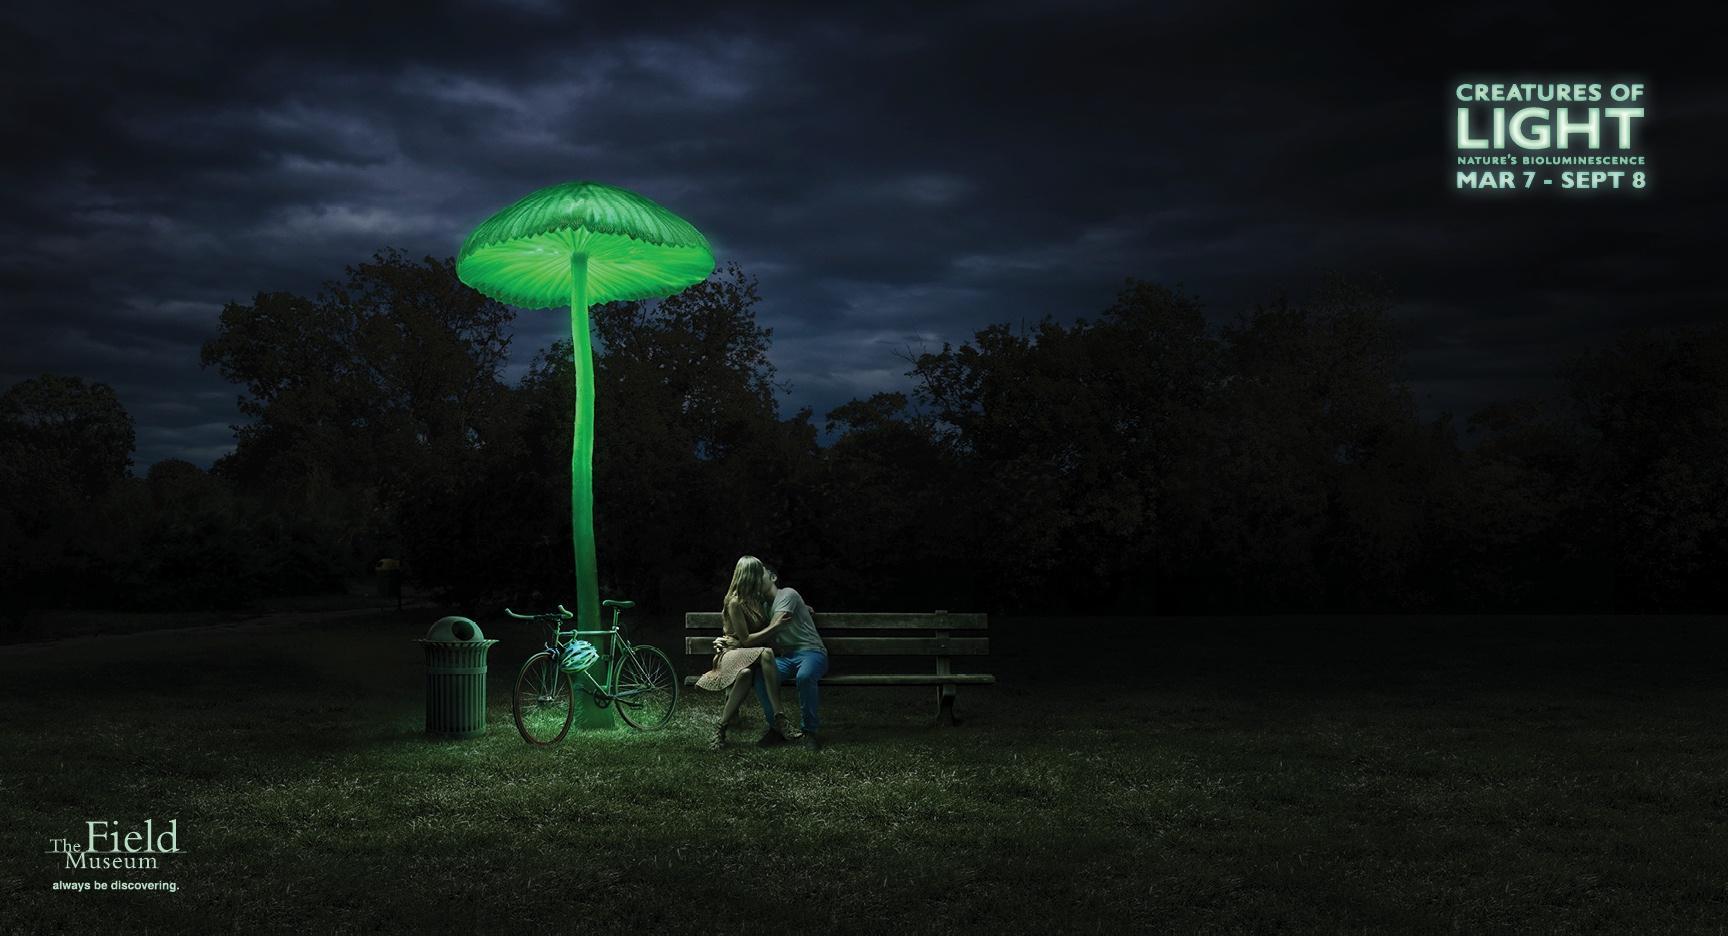 Chicago Field Museum Outdoor Ad -  Creatures of Light, Mushroom